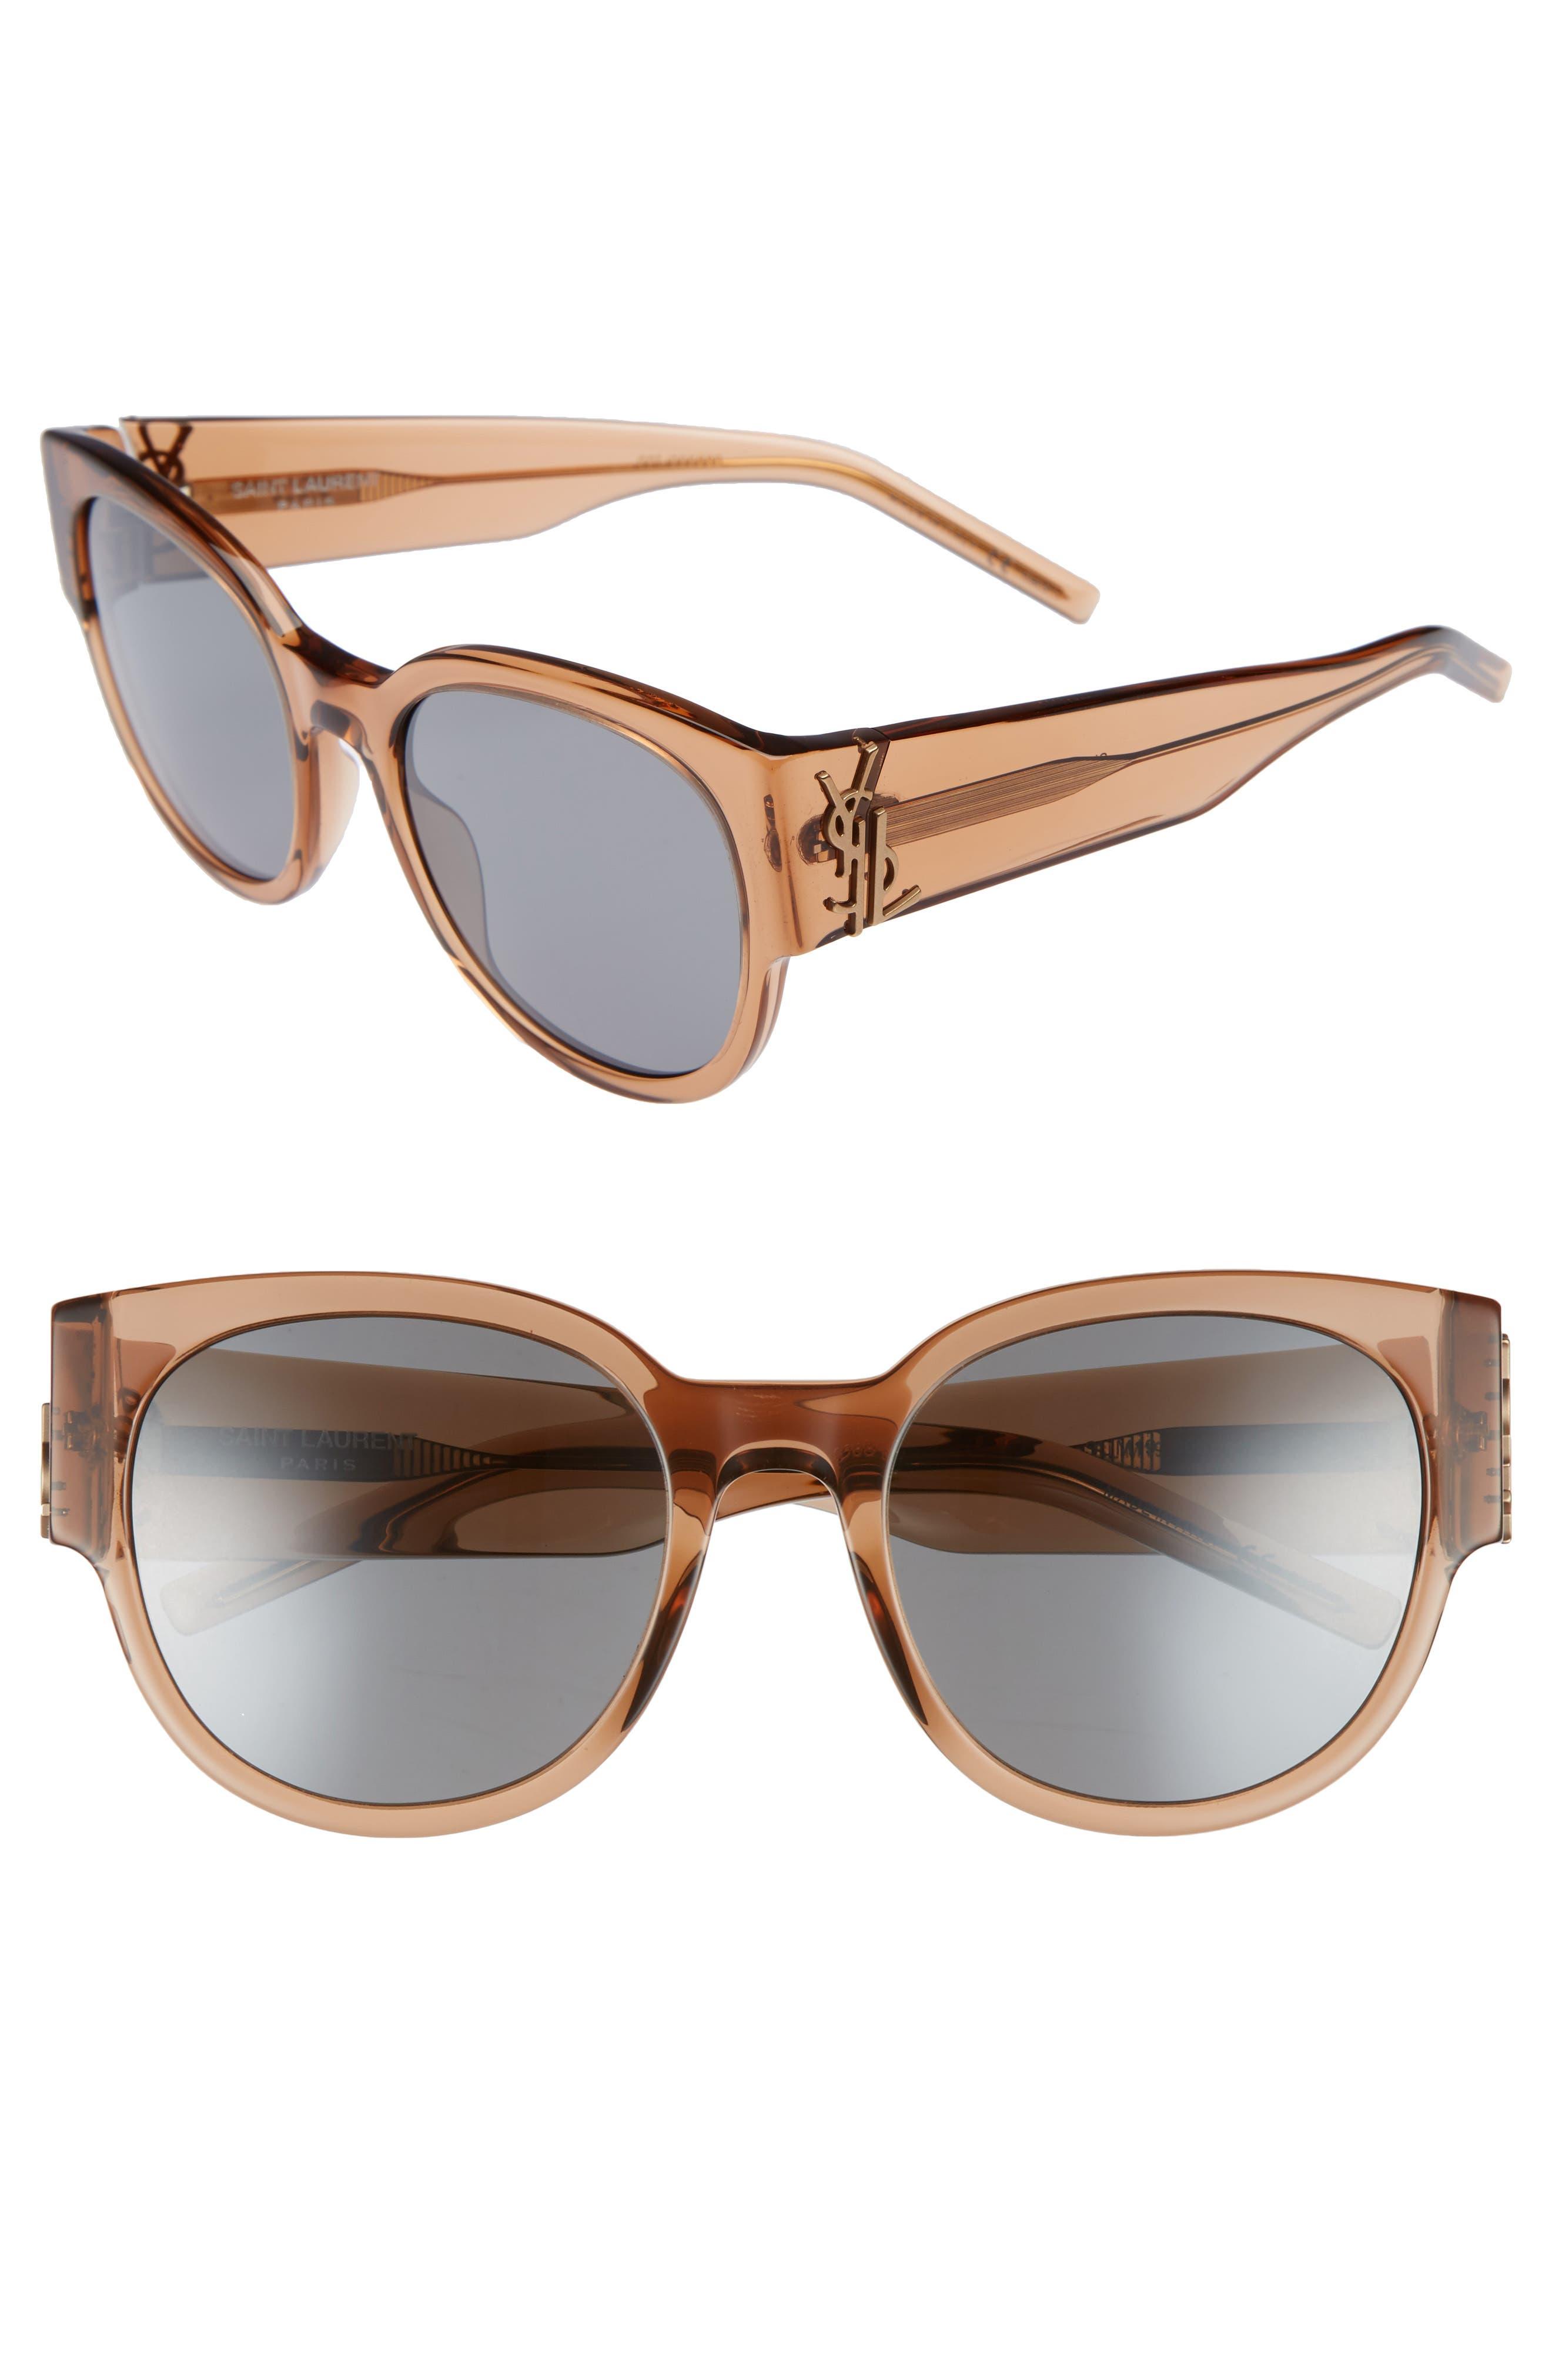 SL M19 54mm Cat Eye Sunglasses,                         Main,                         color, NUDE